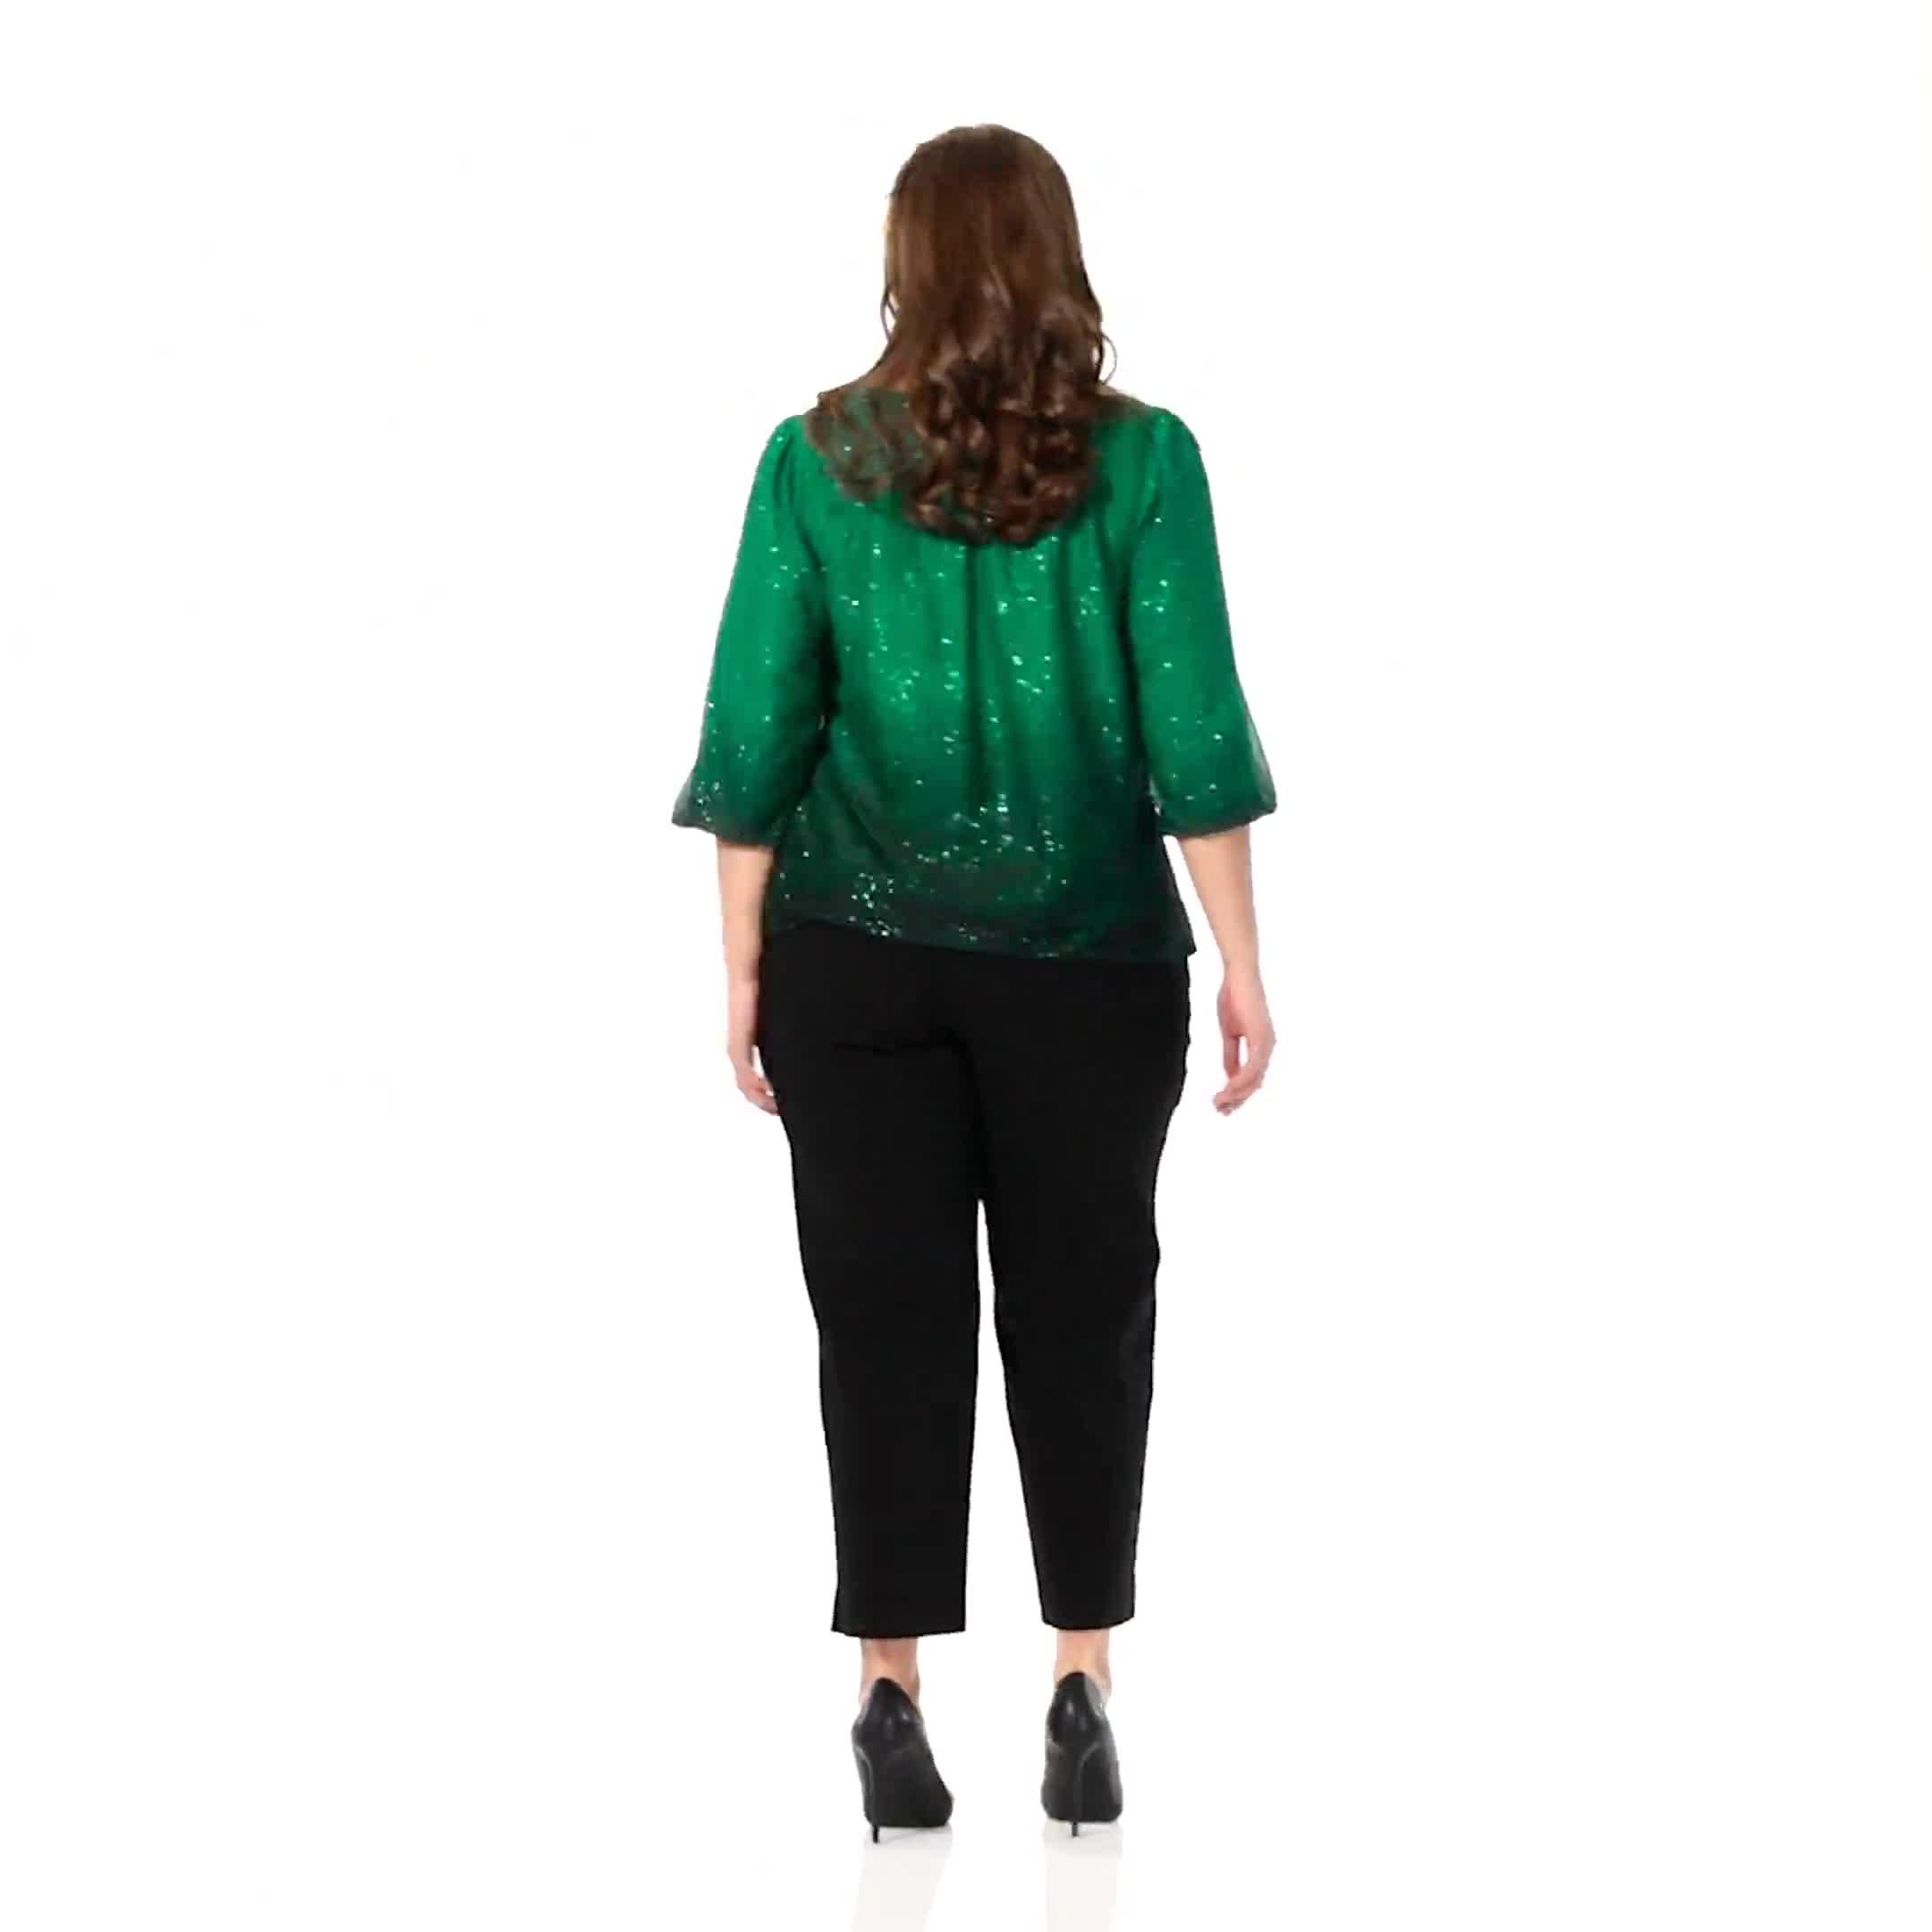 Roz & Ali Emerald Glitter Ombre Bubble Hem Blouse - Plus - Video